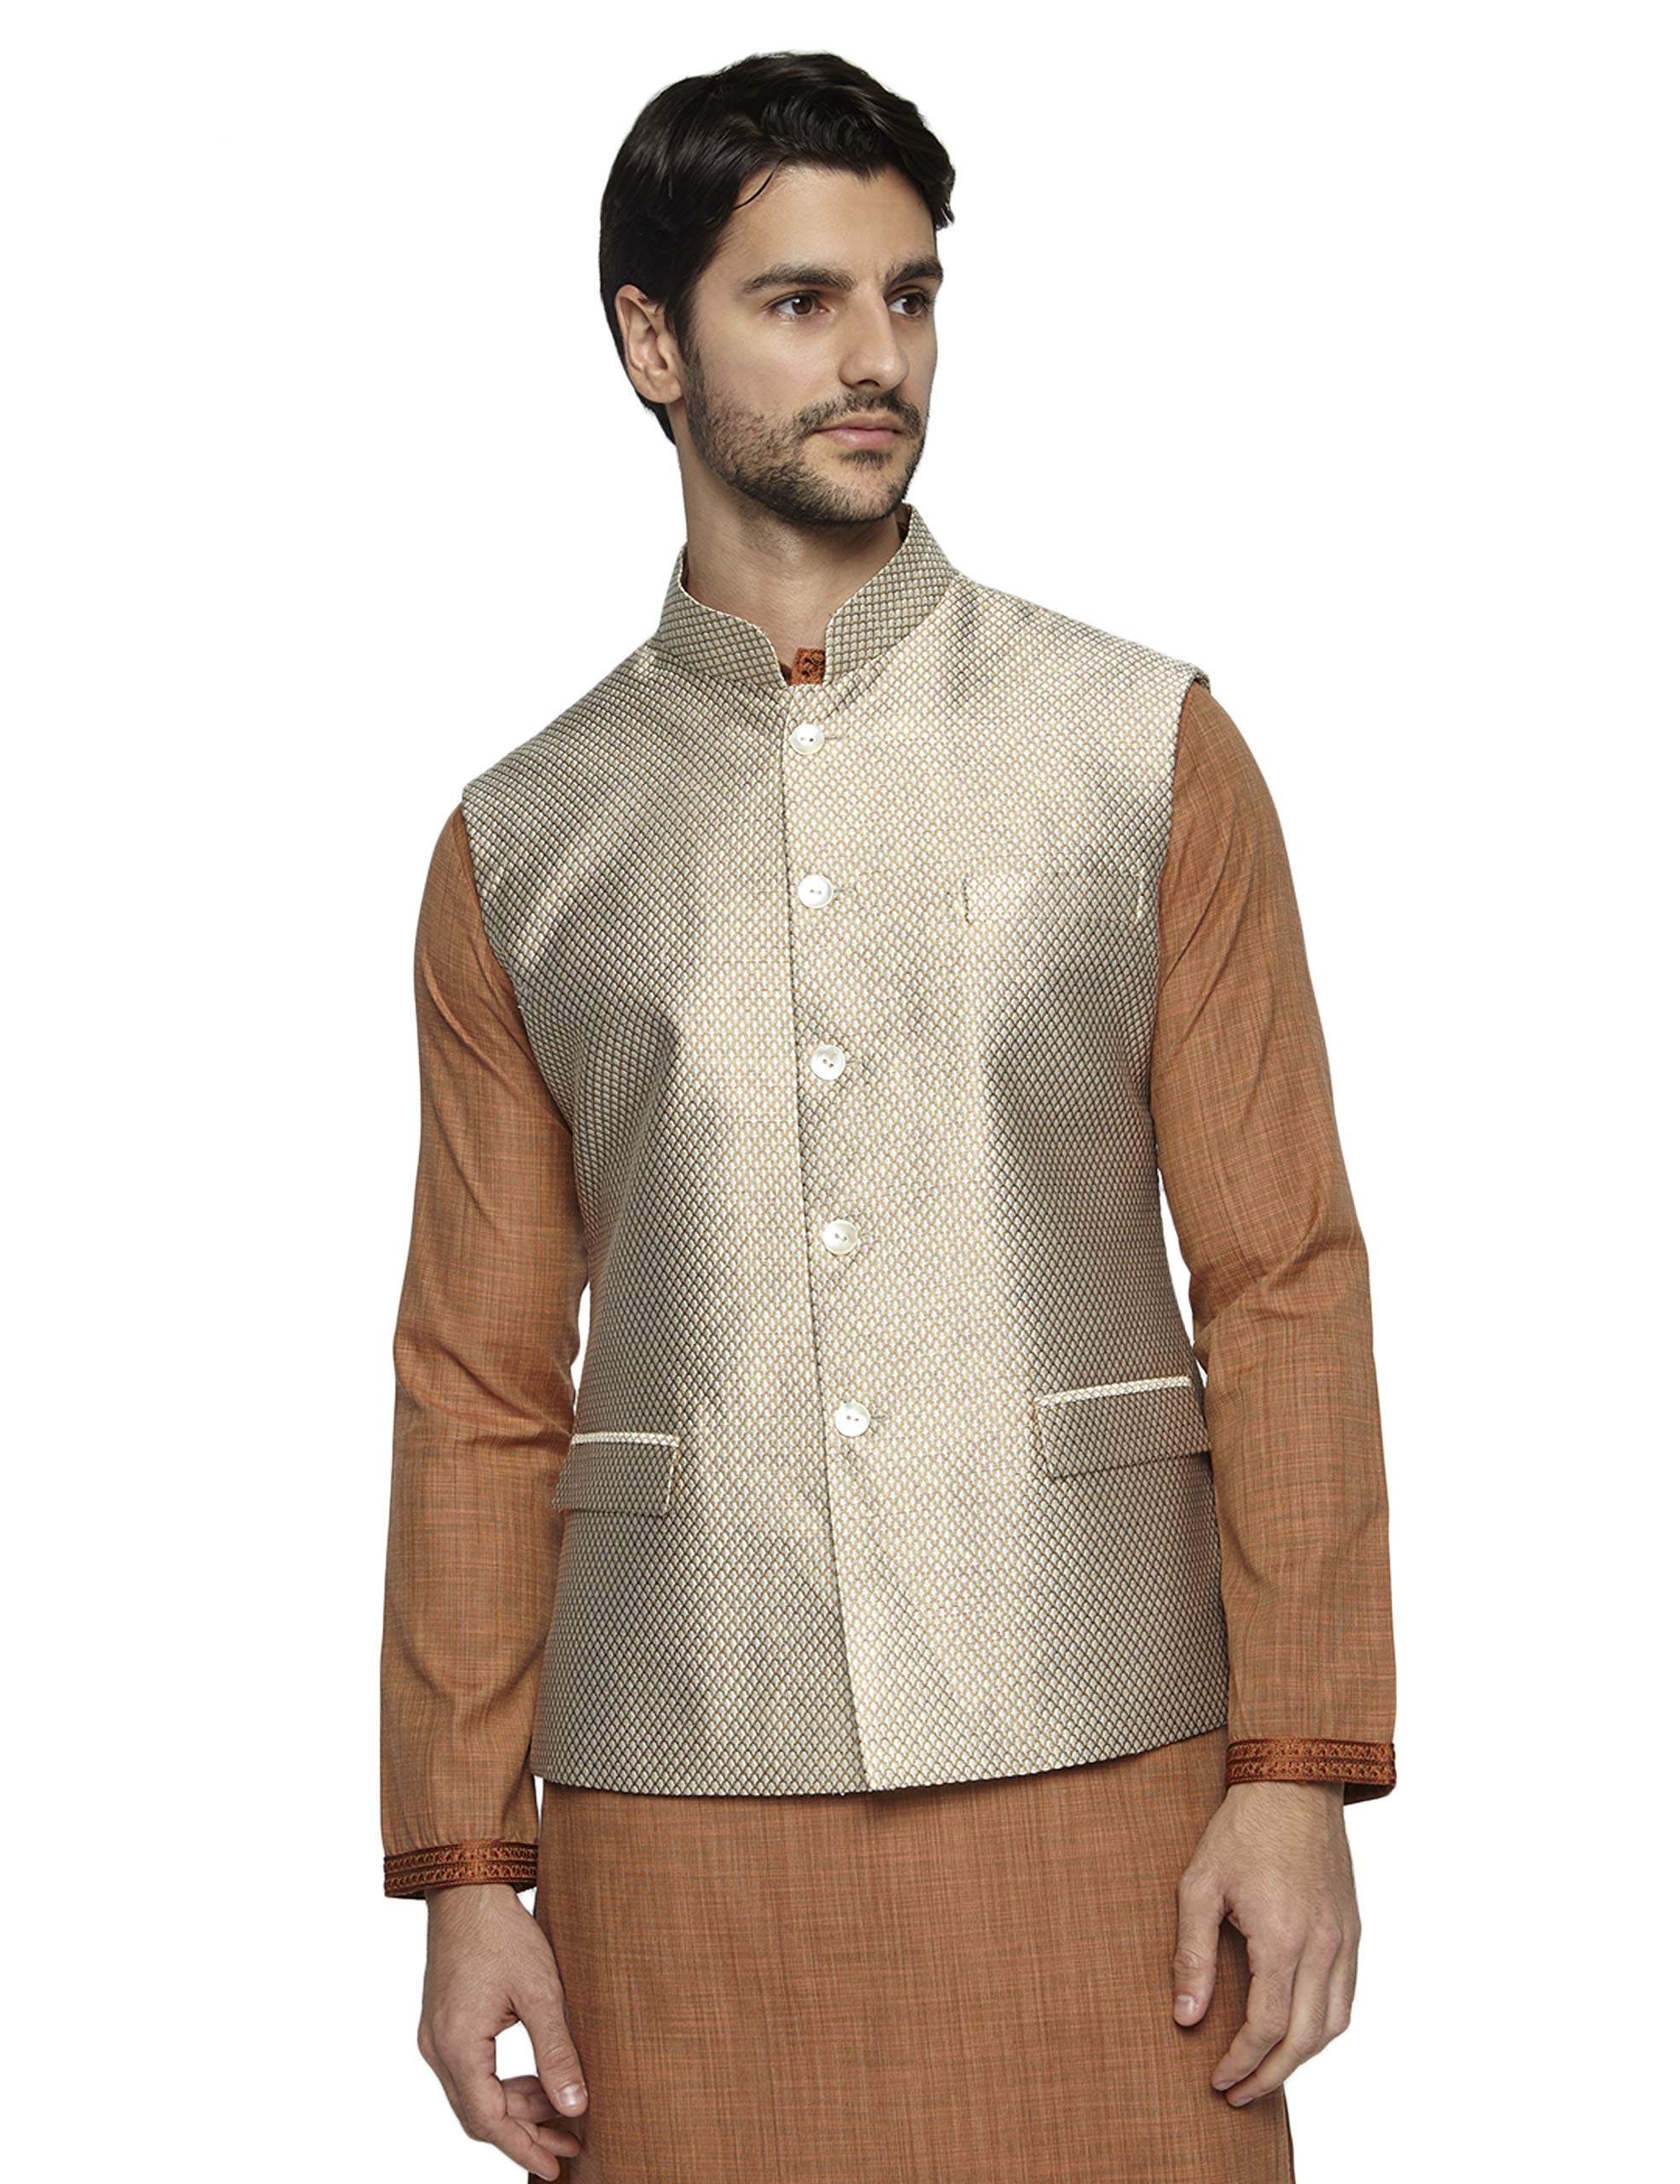 Ethnix by Raymond Men's Light Fawn Cotton Nehru Jacket